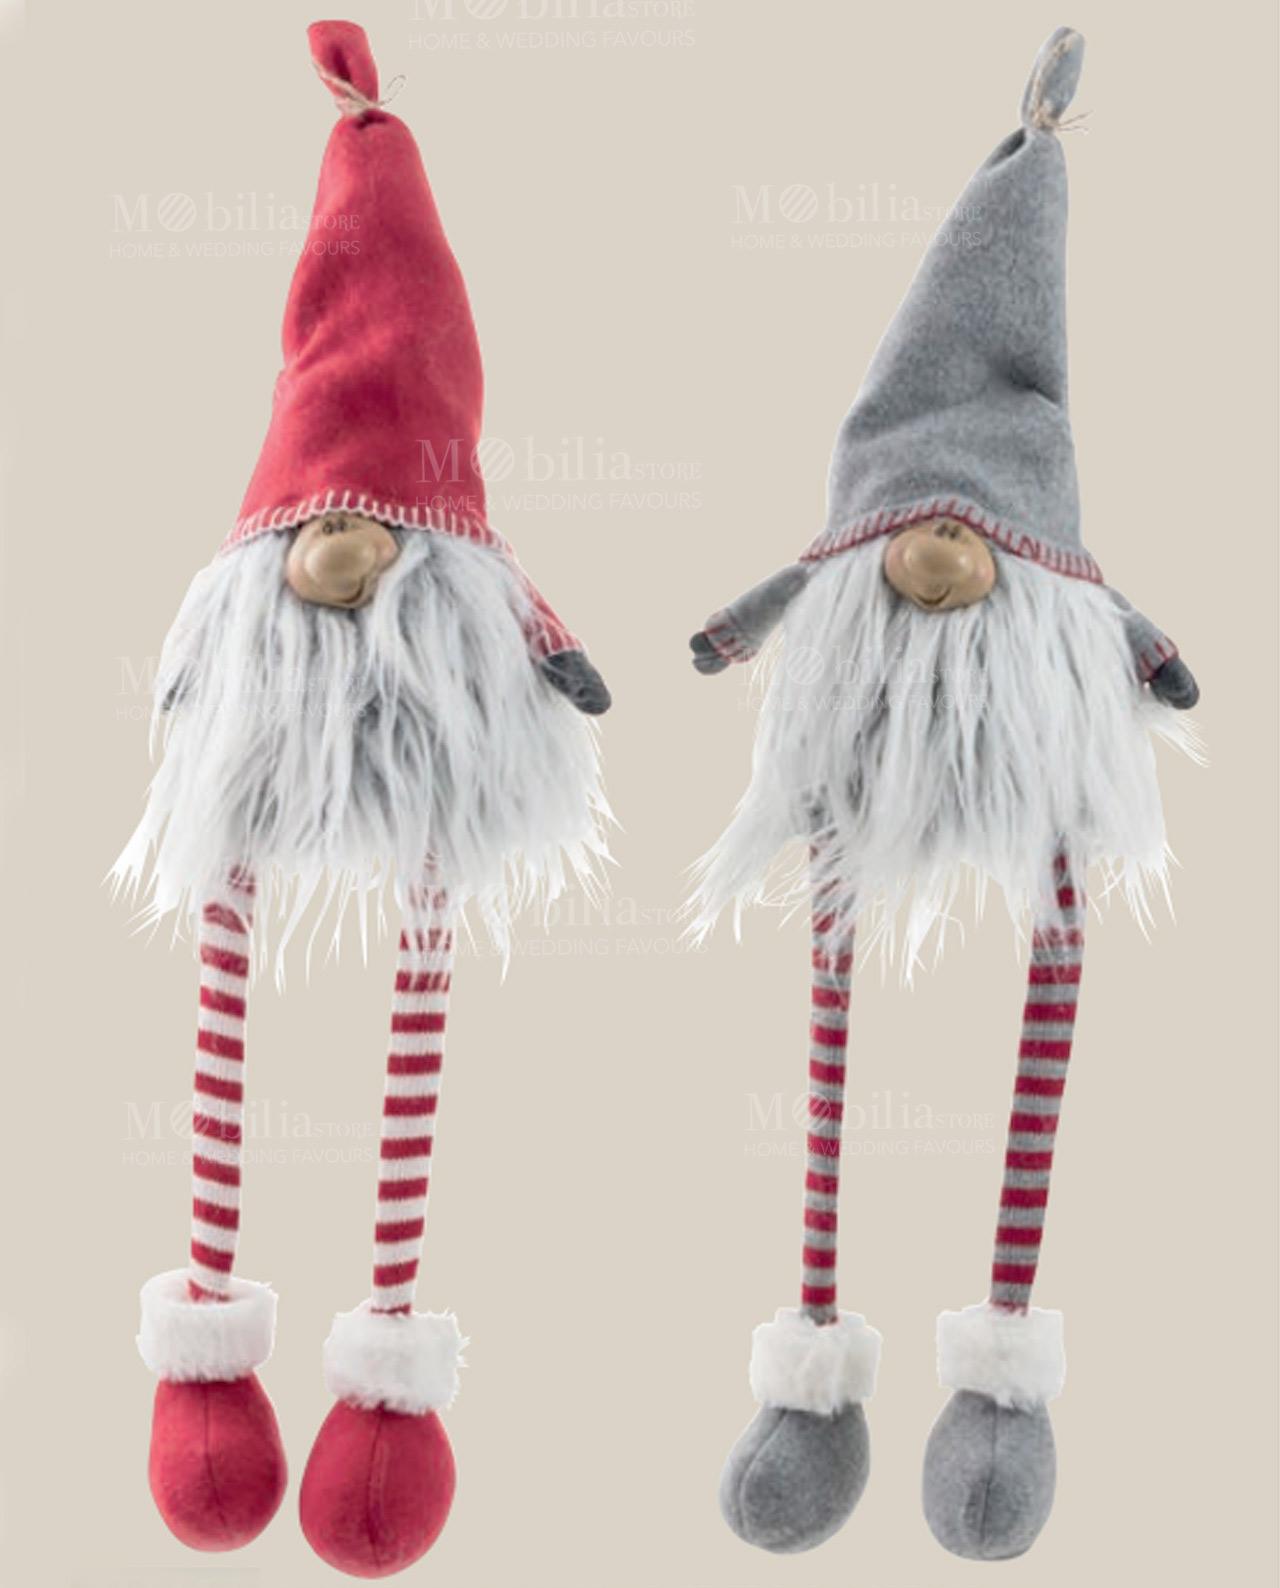 Gnomo cappello feltro e gambe lunghe righe rosse - Mobilia Store ... a8a1d8845c7a